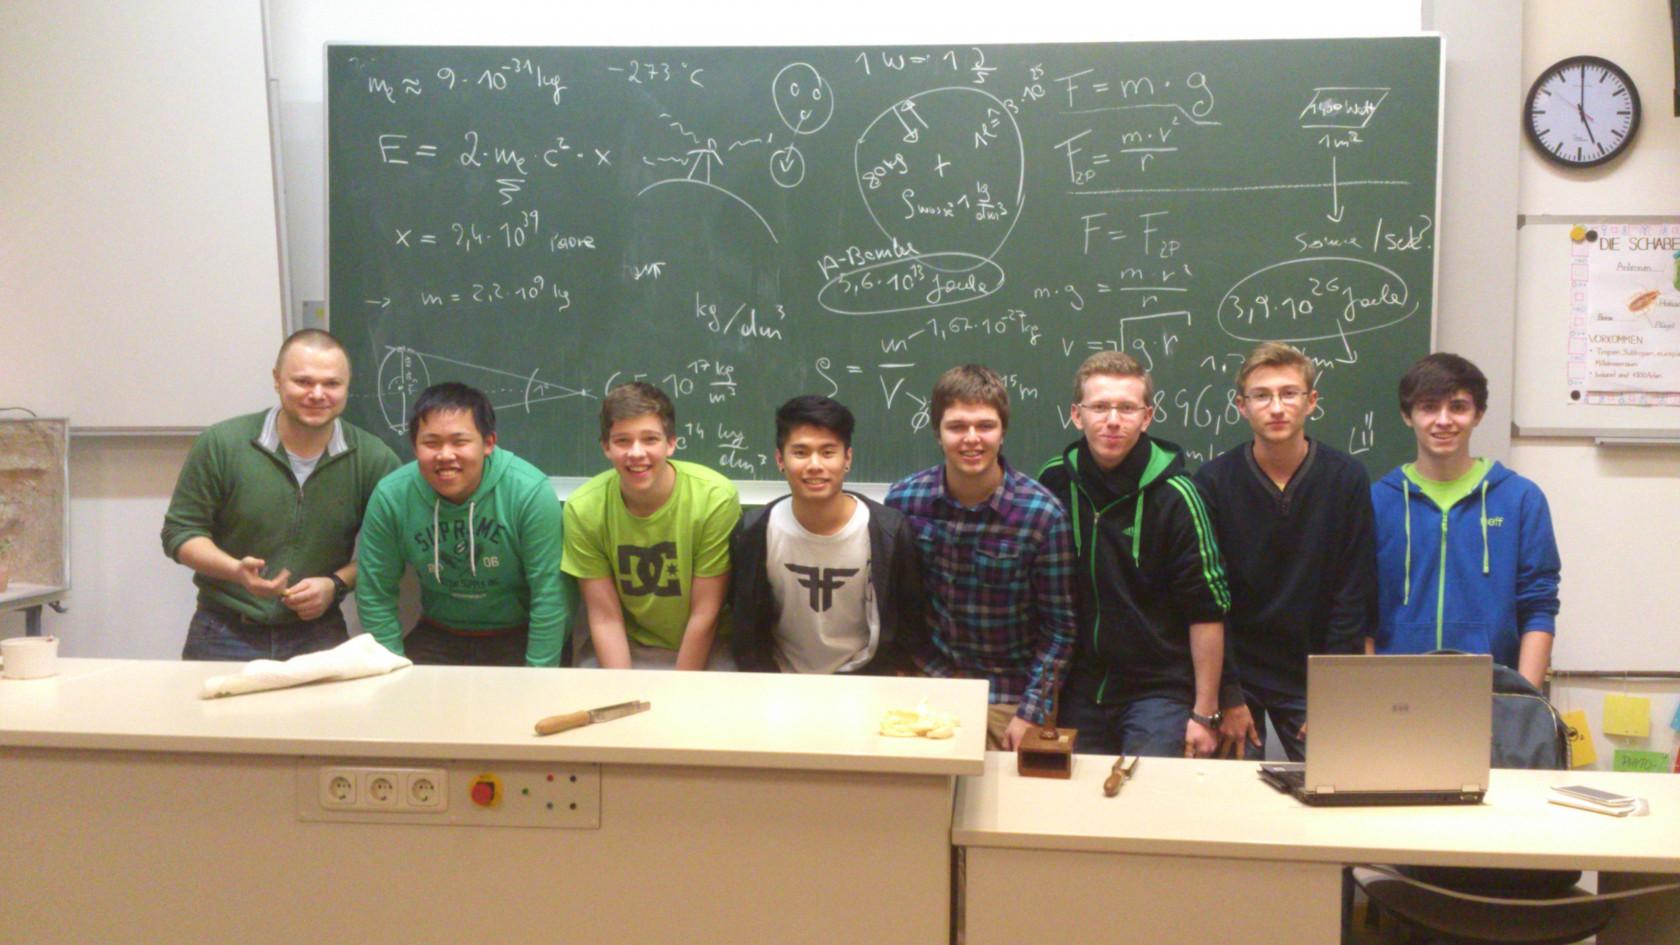 pho-team 2012-2013